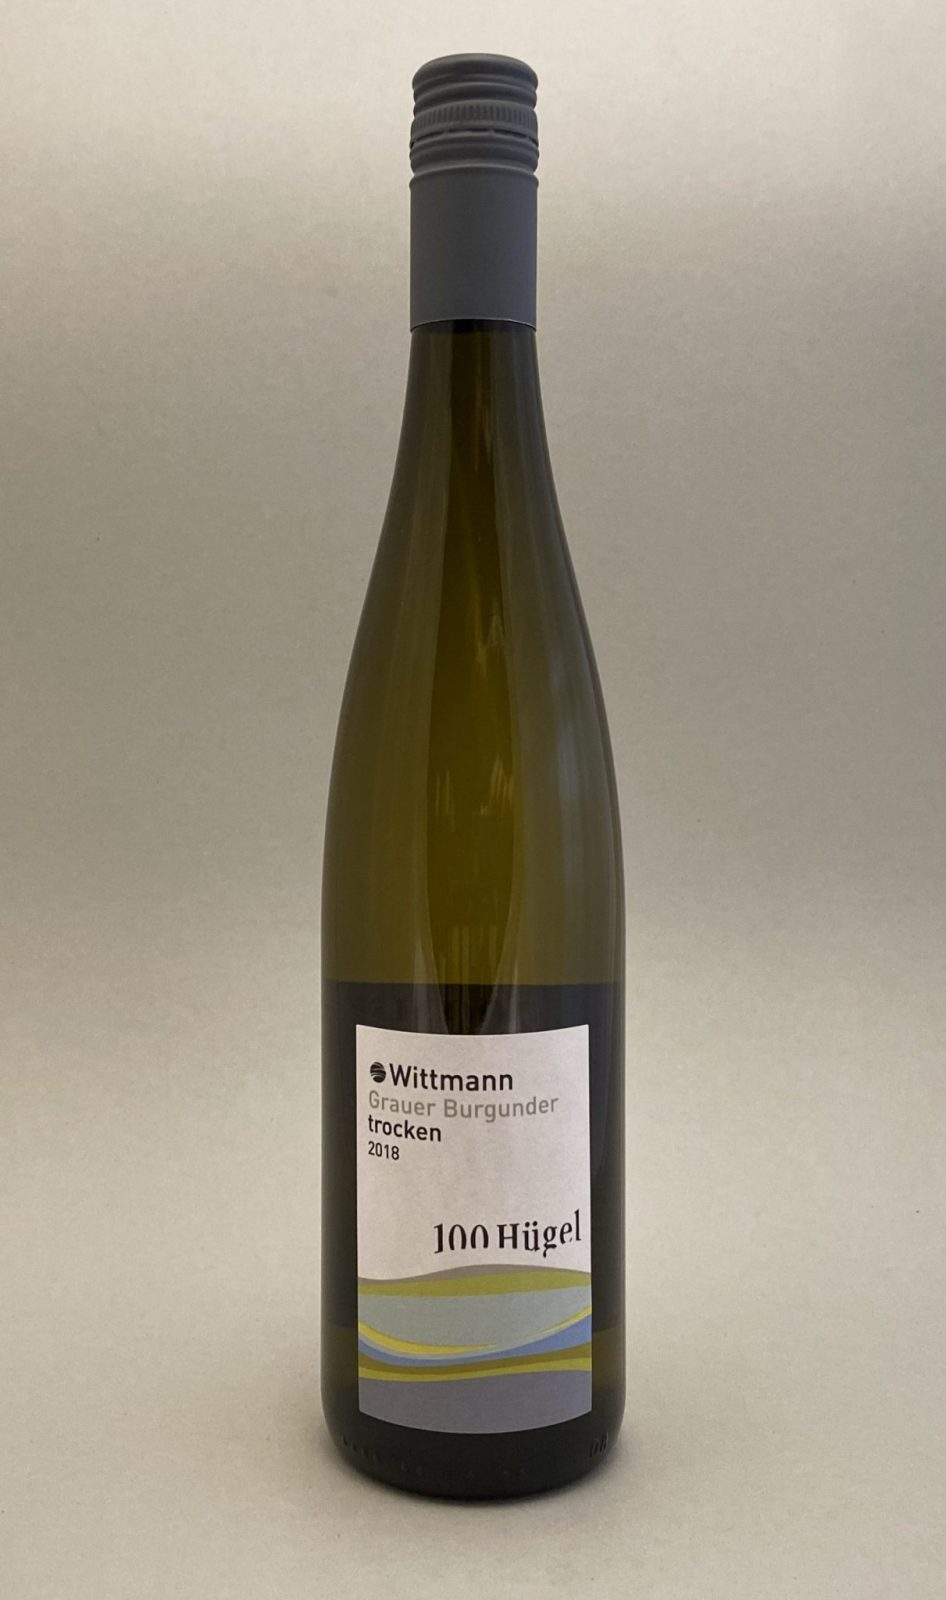 WITTMANN 100 Hügel Grauer Burgunder 2018, vinoteka Bratislava Sunny wines slnecnice mesto, petrzalka, vino biele z Nemecka